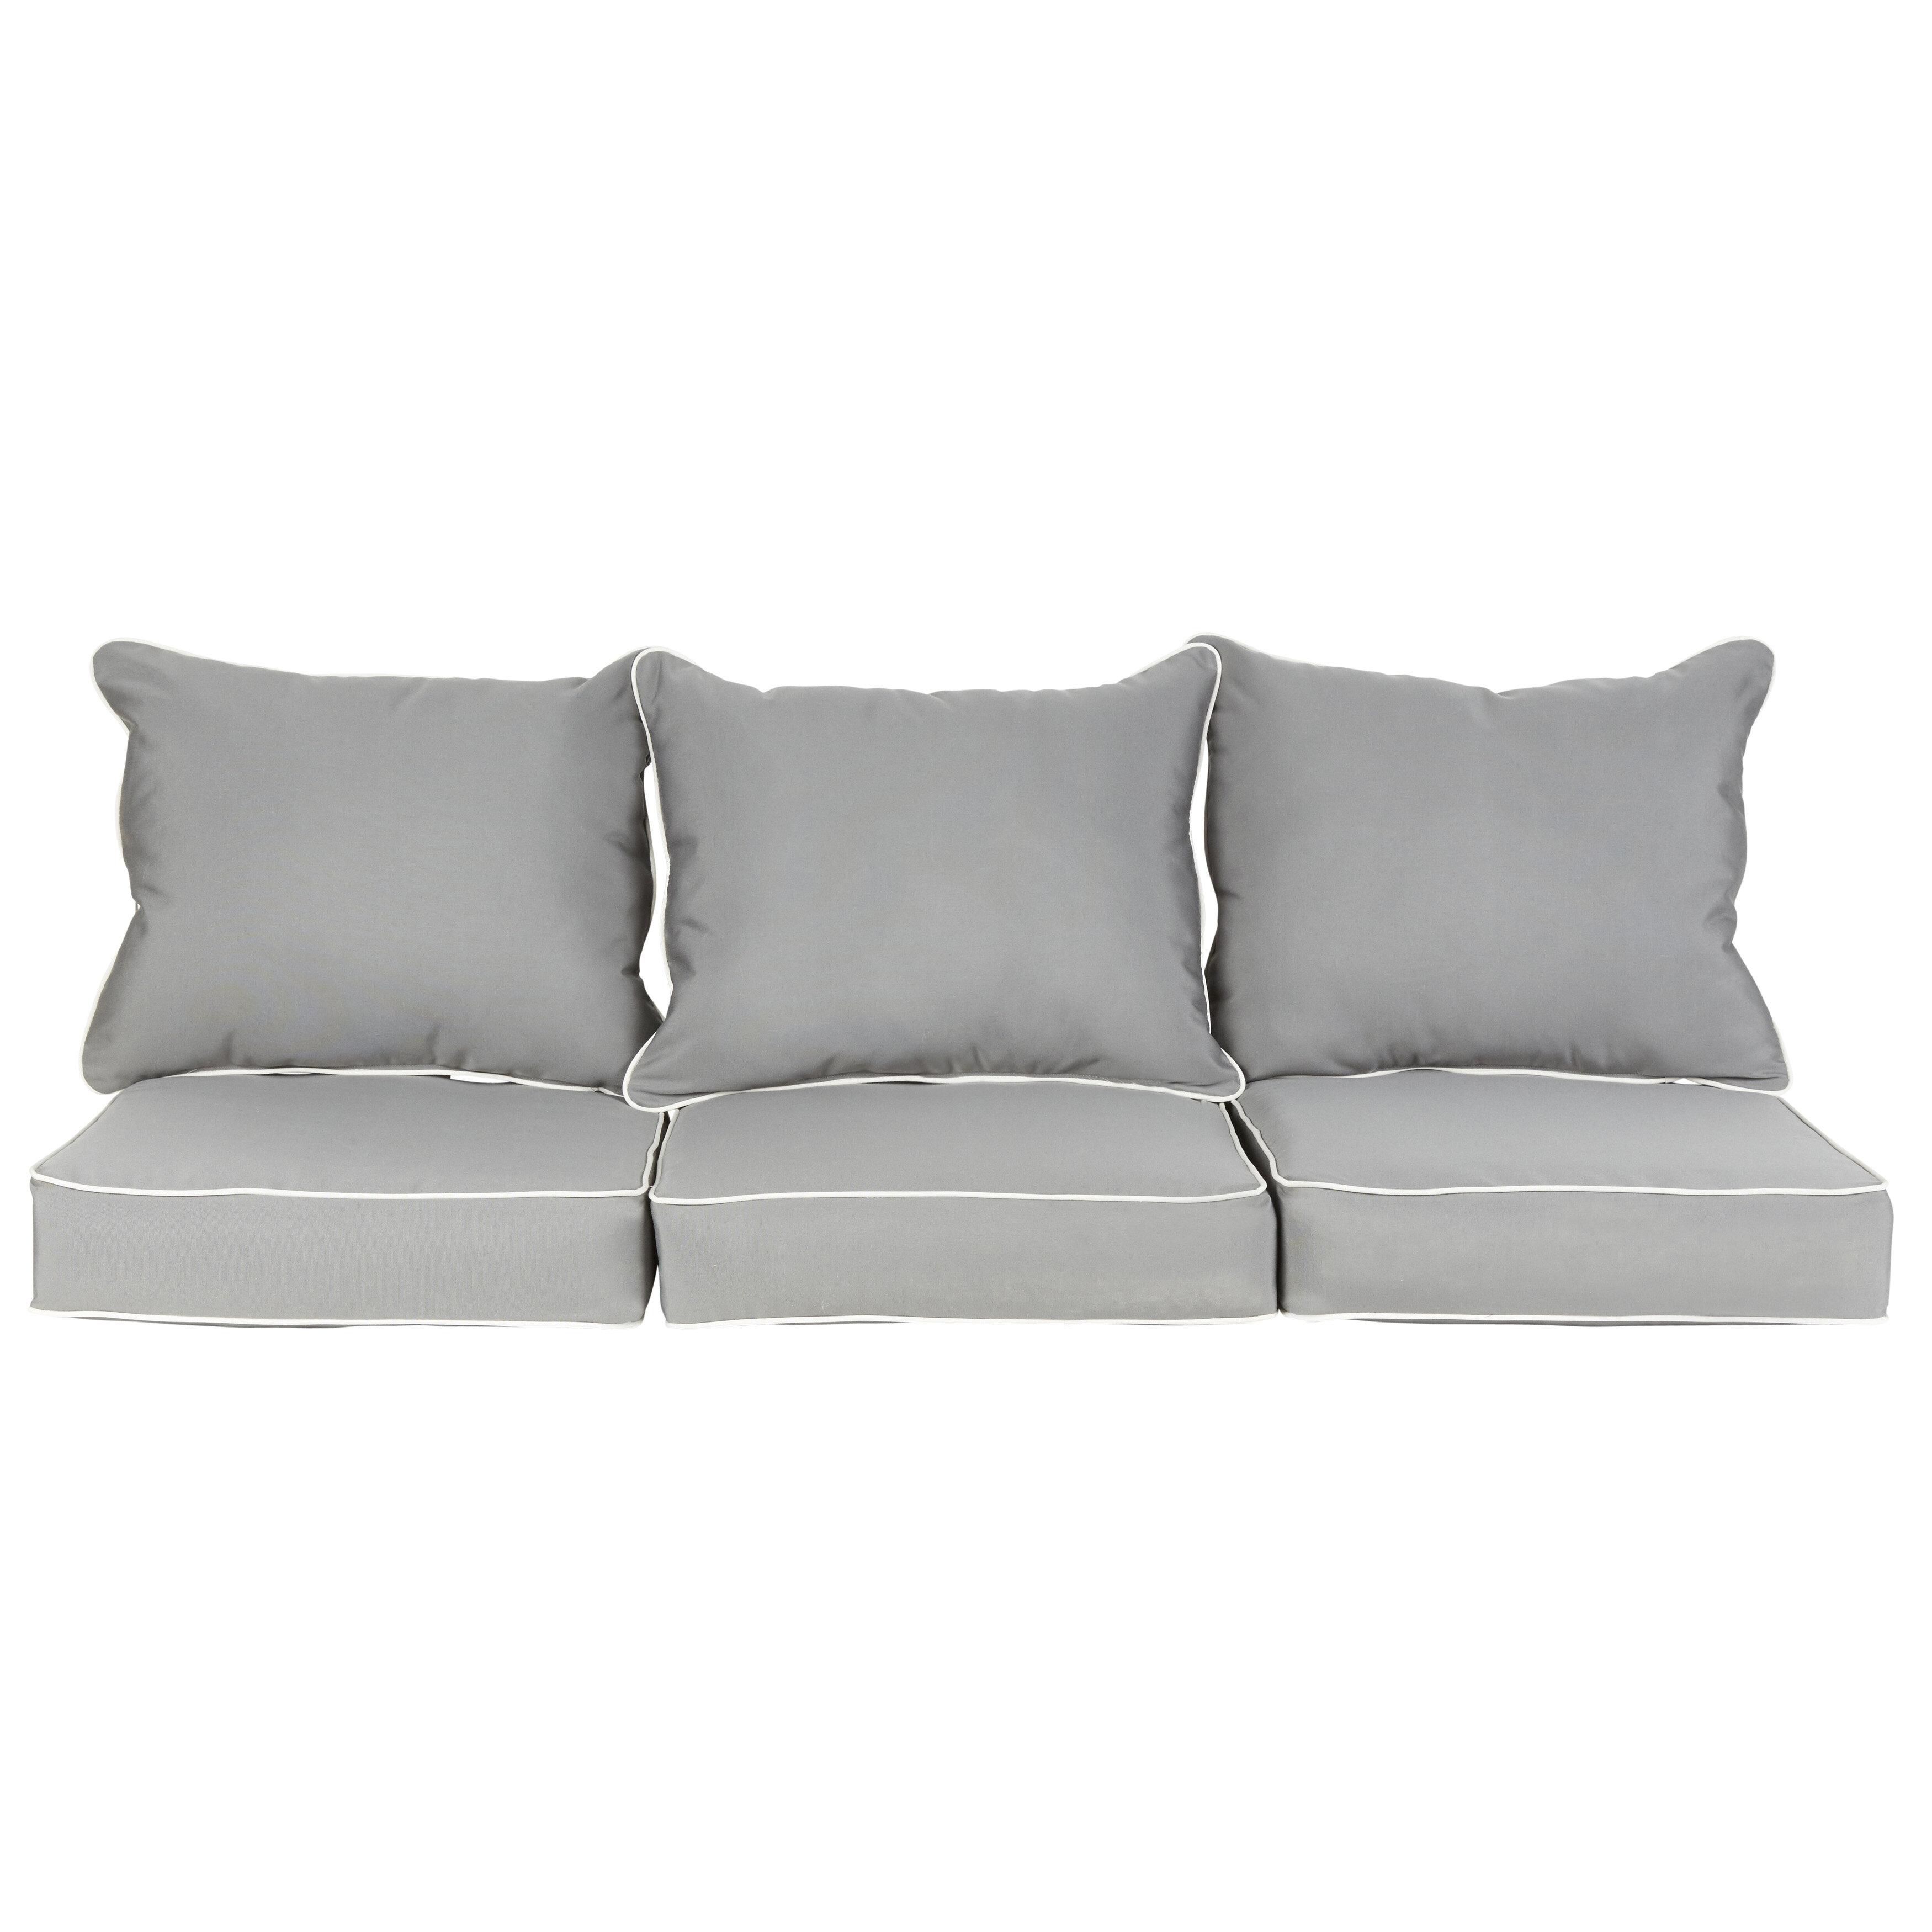 Beachcrest Home Feldspar Indoor Outdoor Sunbrella Sofa Cushion Reviews Wayfair